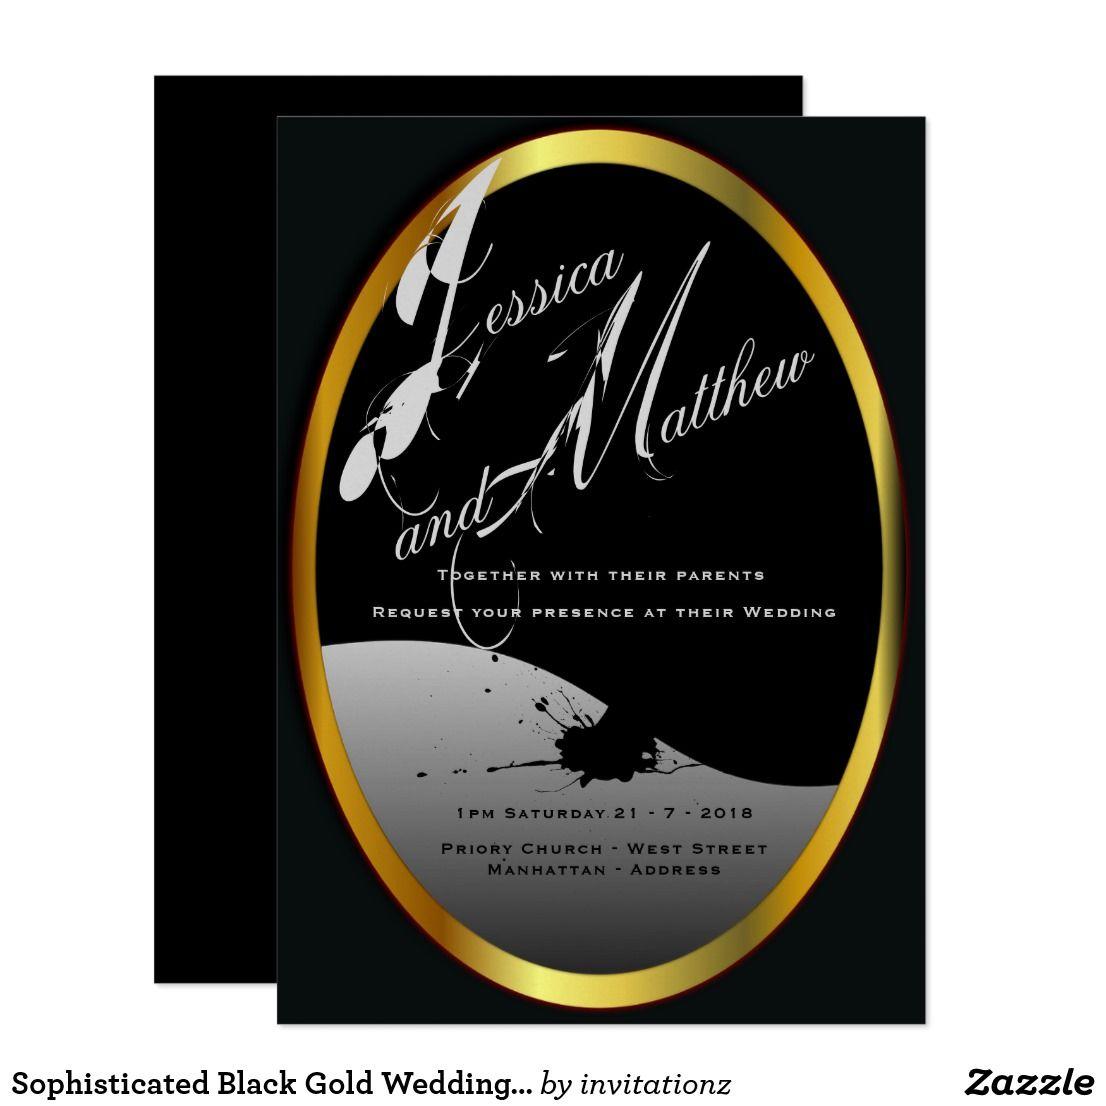 Pin by leahg on trending wedding themes pinterest wedding